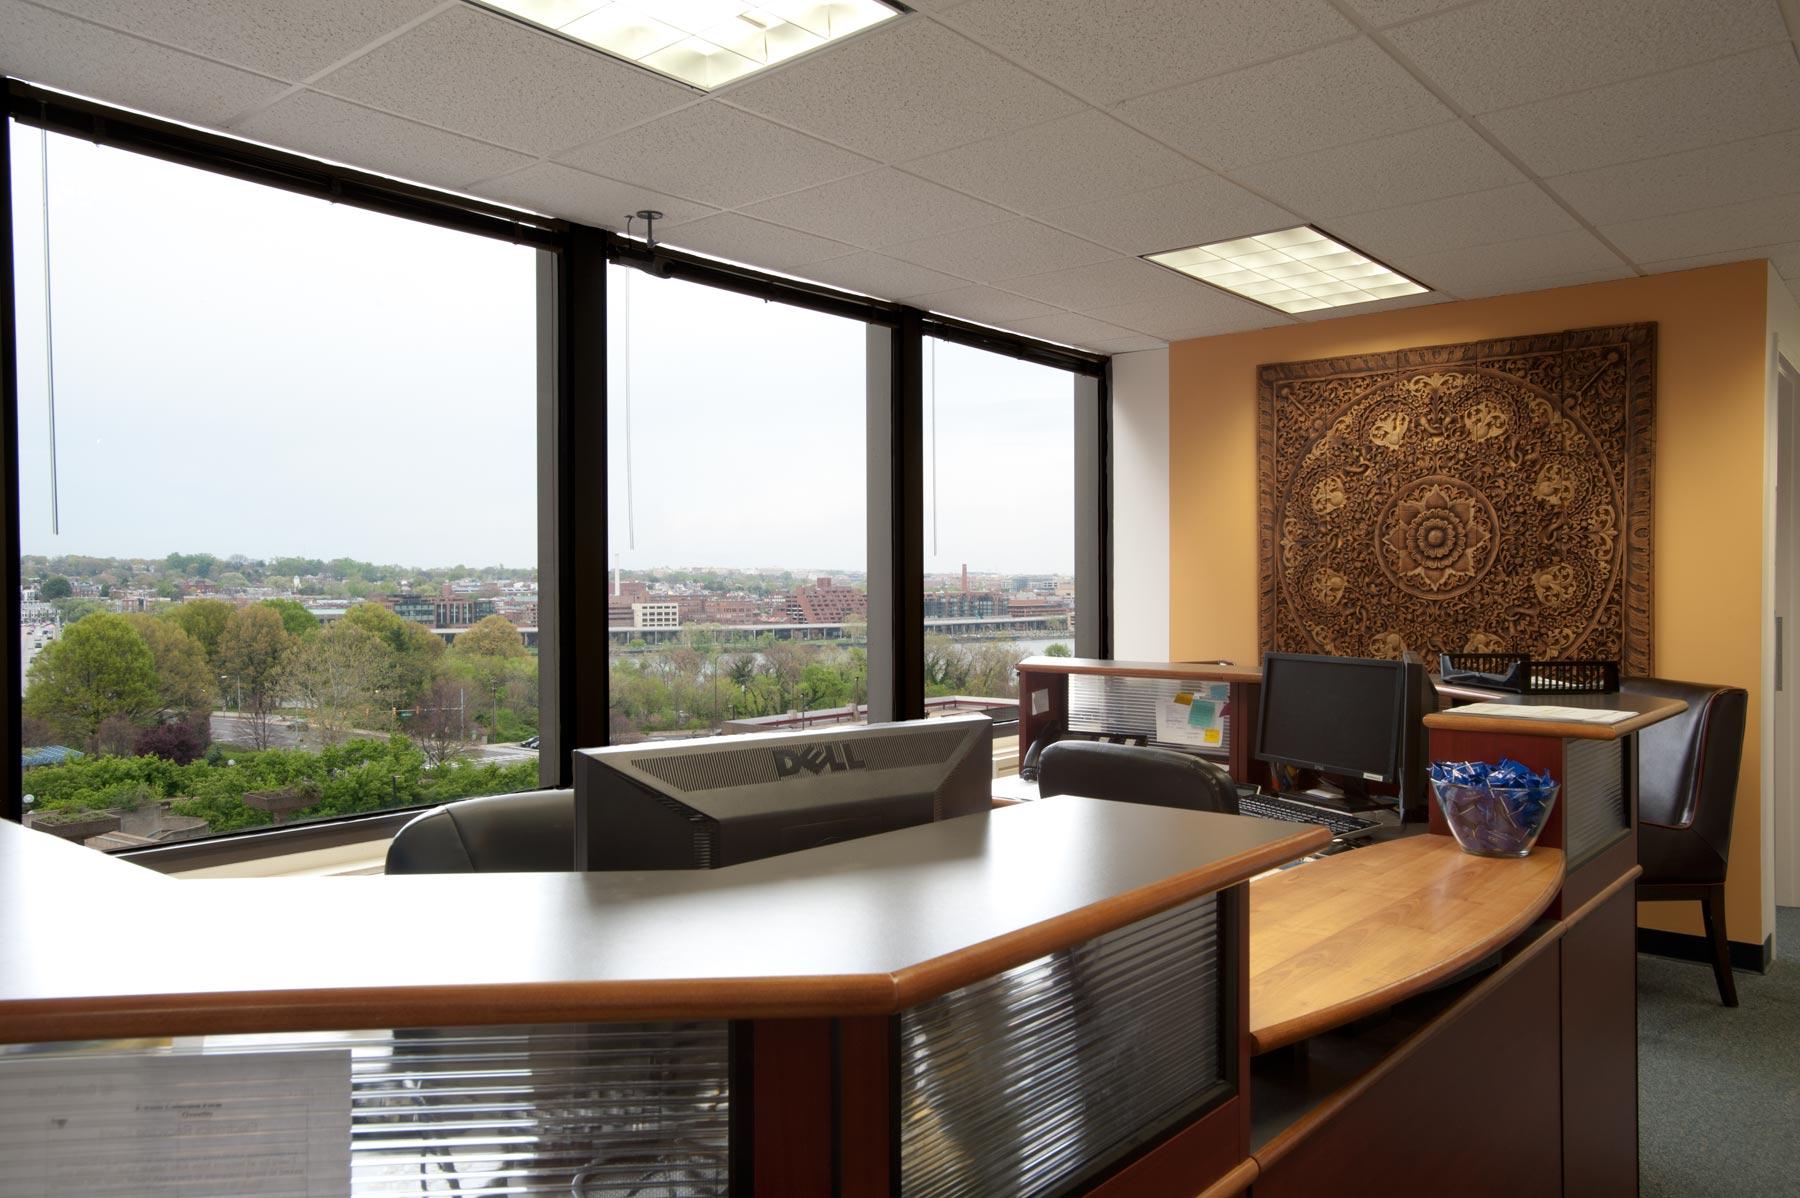 Diplomatic Language Services Arlington location front desk and reception area